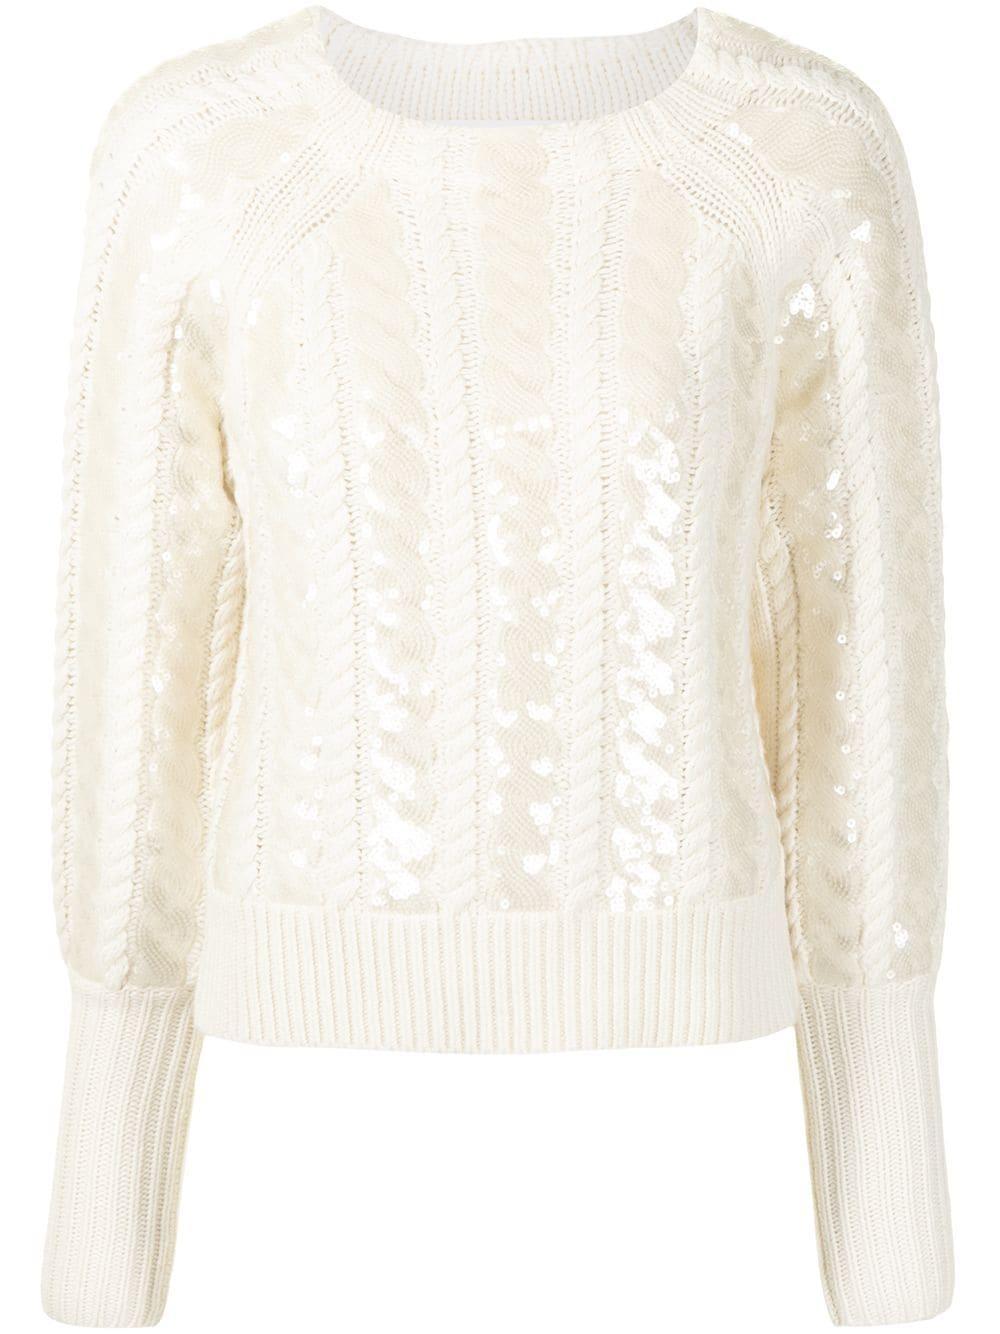 Yola Sequin Sweater Item # 2010KN5209513